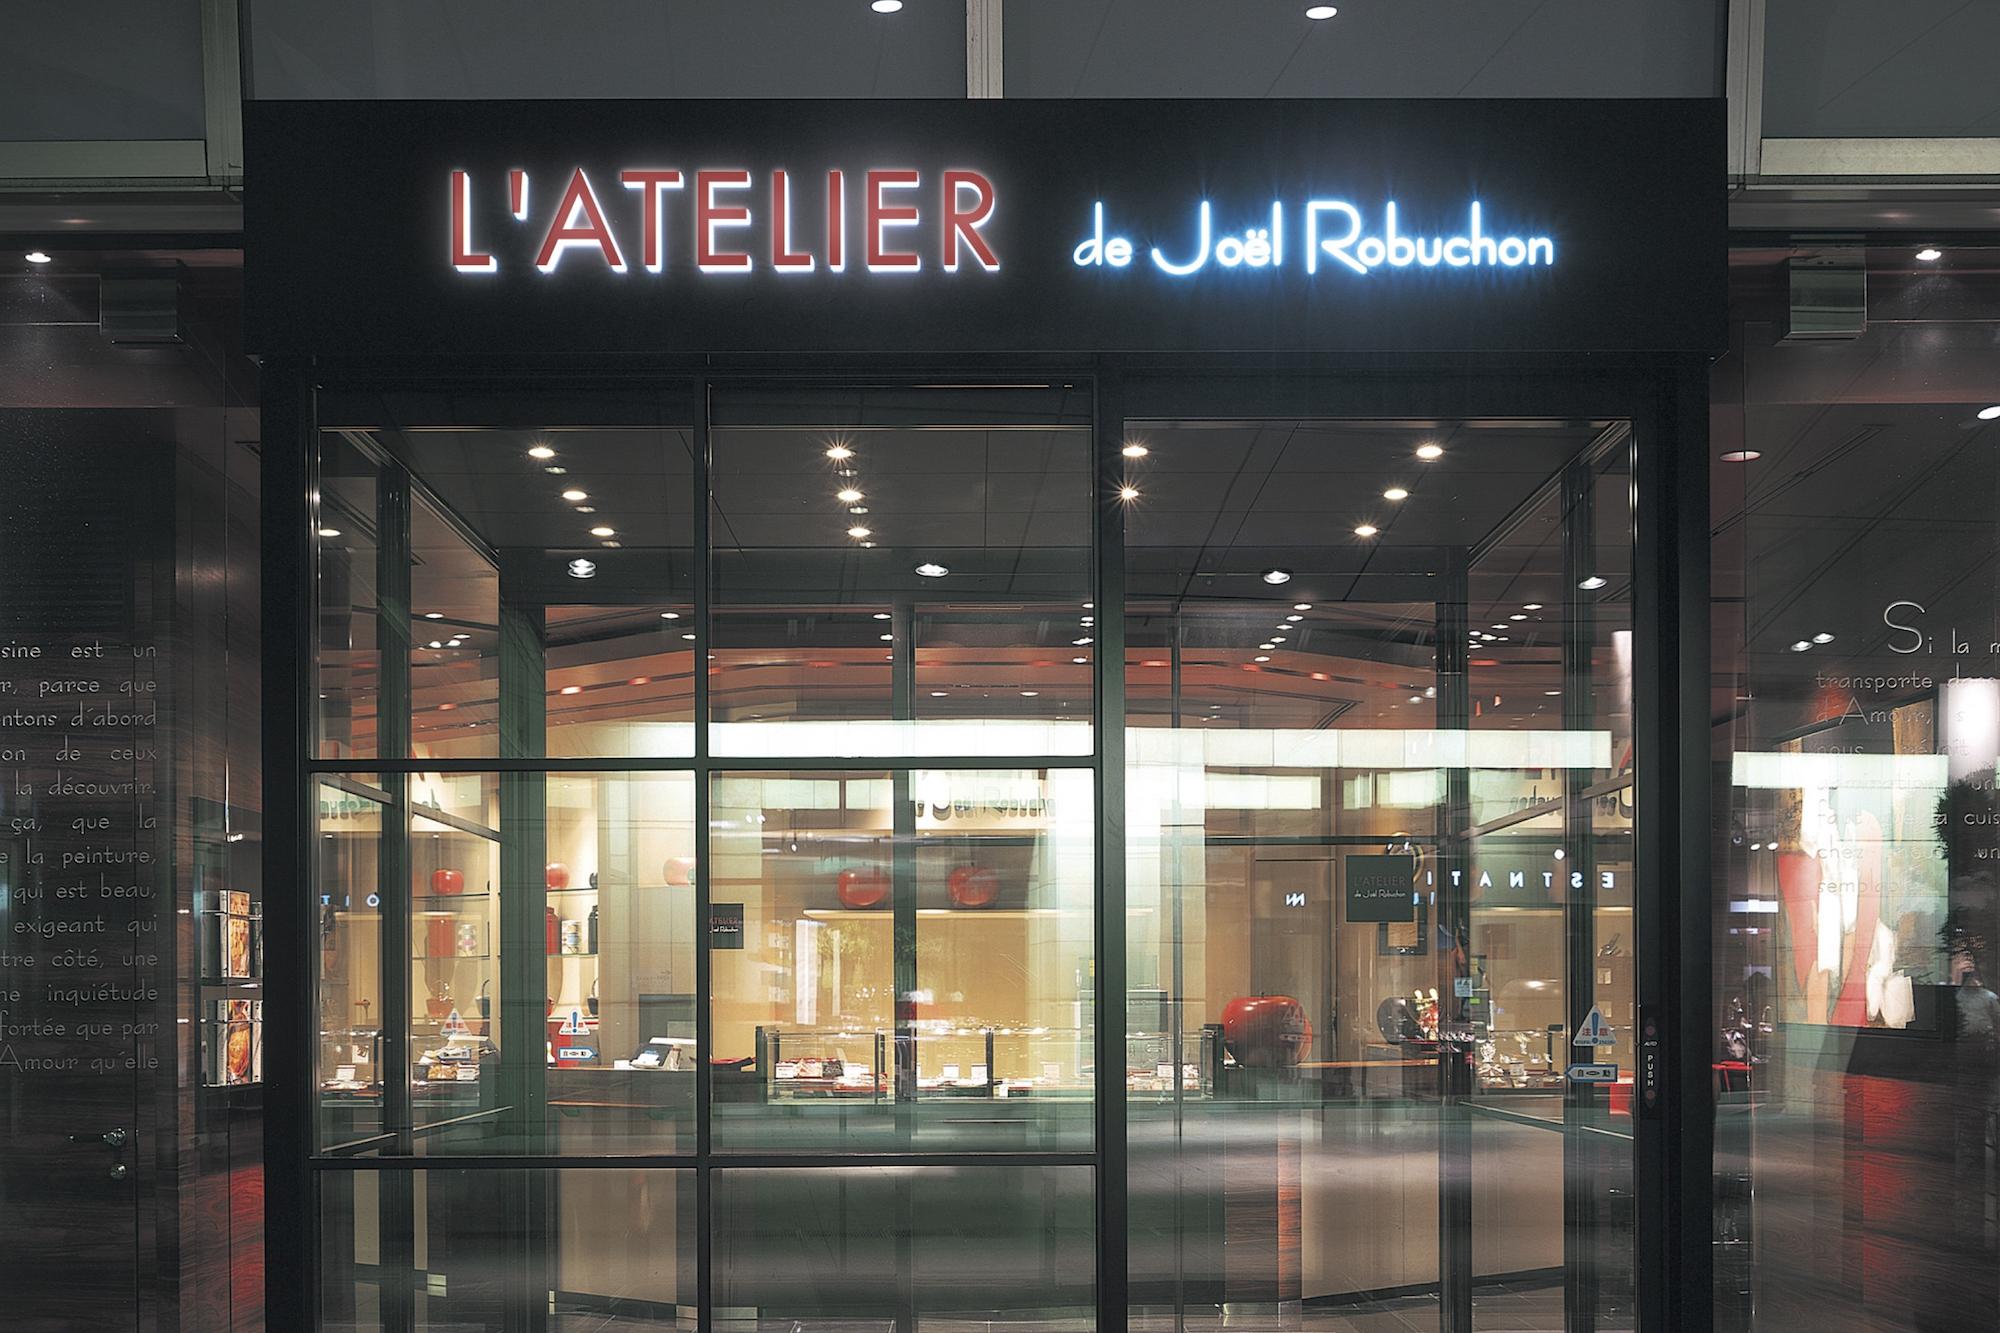 L'ATELIER de Joël Robuchon(ラトリエ ドゥ ジョエル・ロブション)外観